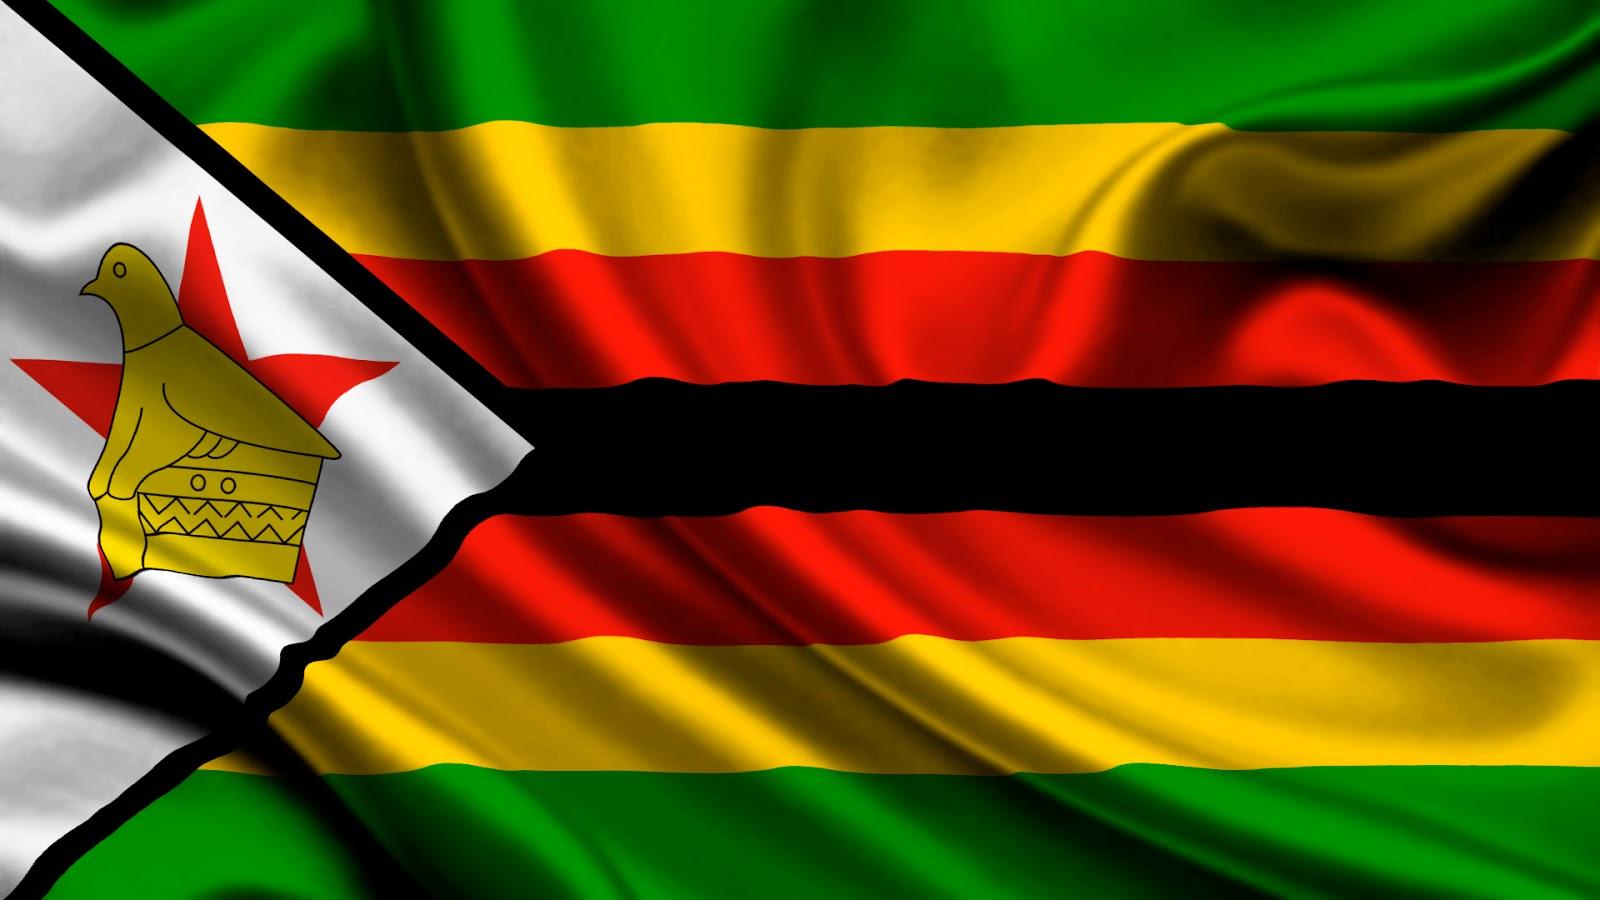 zimbabwe free dating online Records 1 - 10 of 730 zimbabwe christian dating meet quality christian singles in zimbabwe christian dating for free is the #1 online christian community.